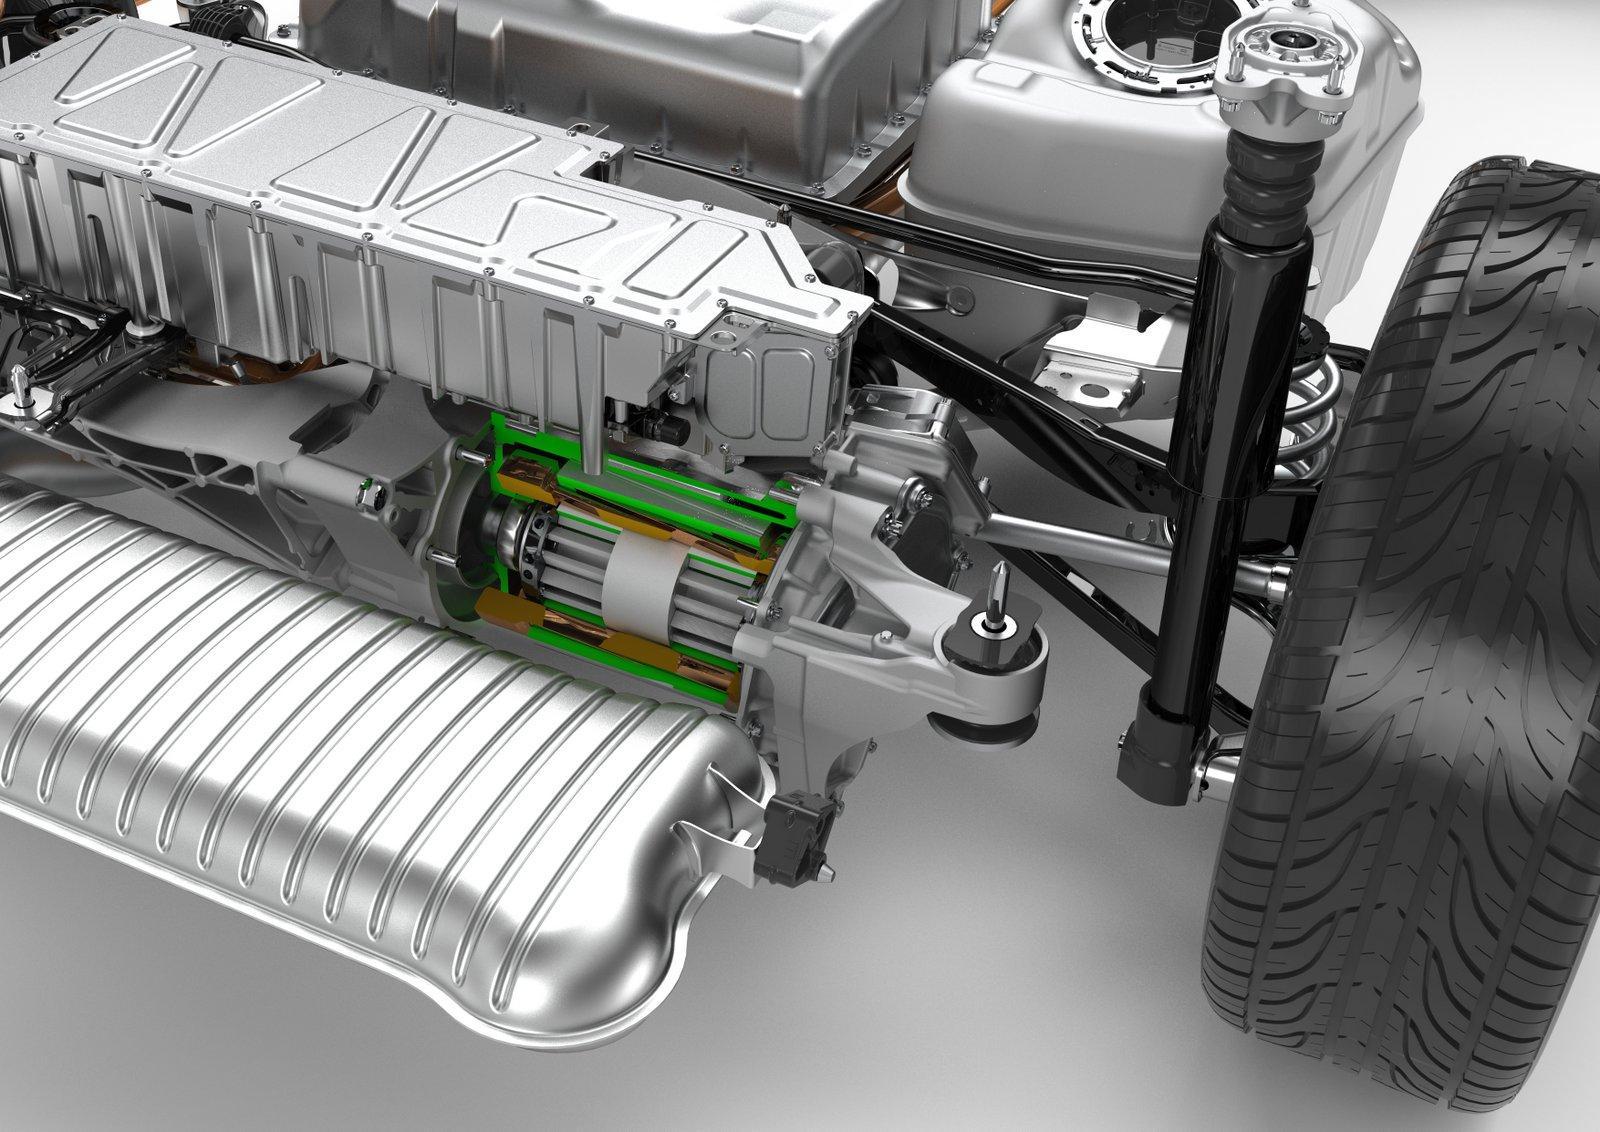 2015 BMW 225xe PHEV Active Tourer electric motor unveiled